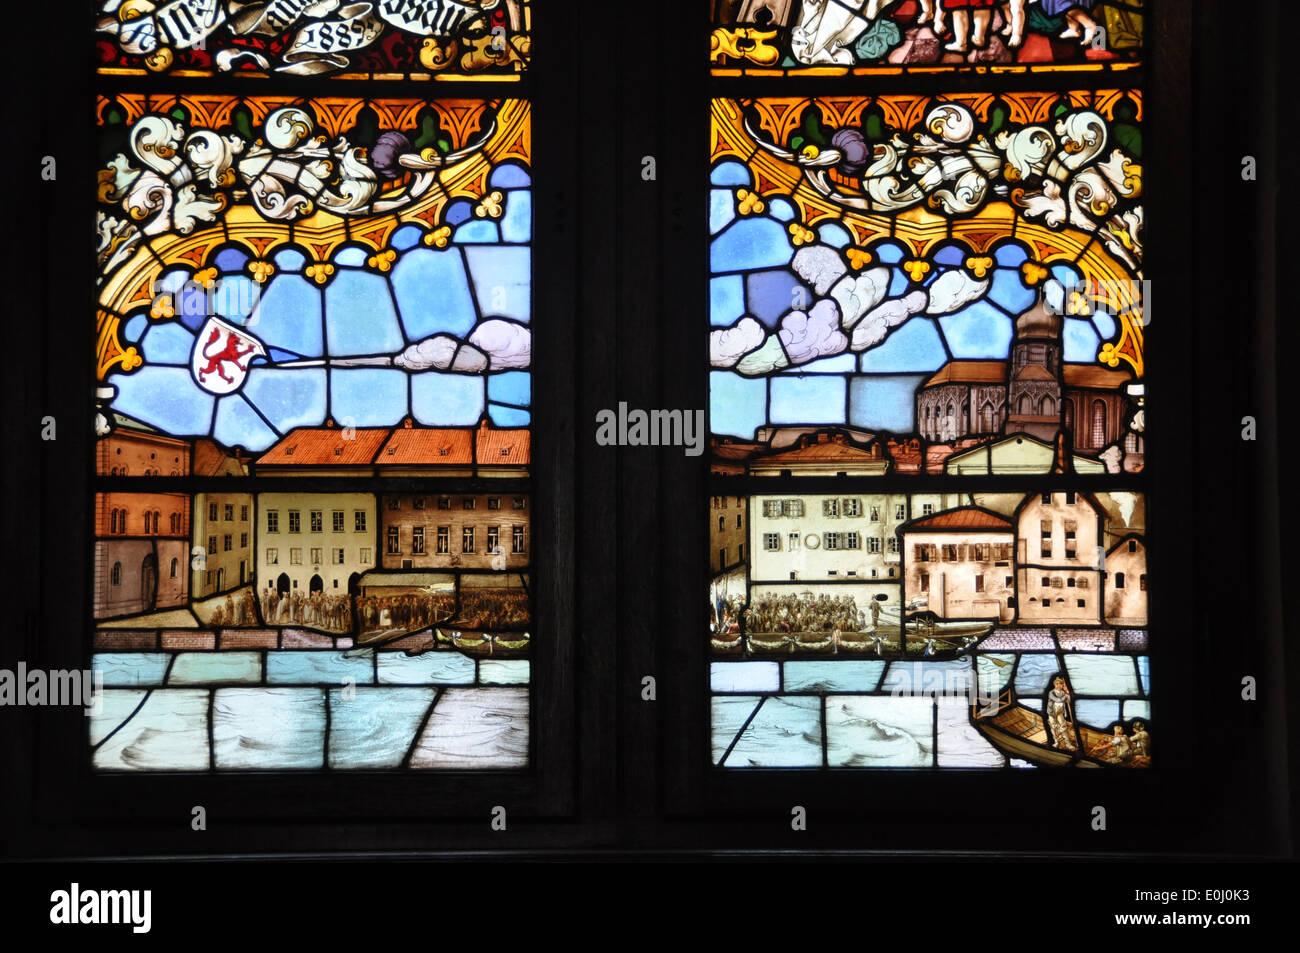 Stain glass panels portraying the Passau skyline. - Stock Image